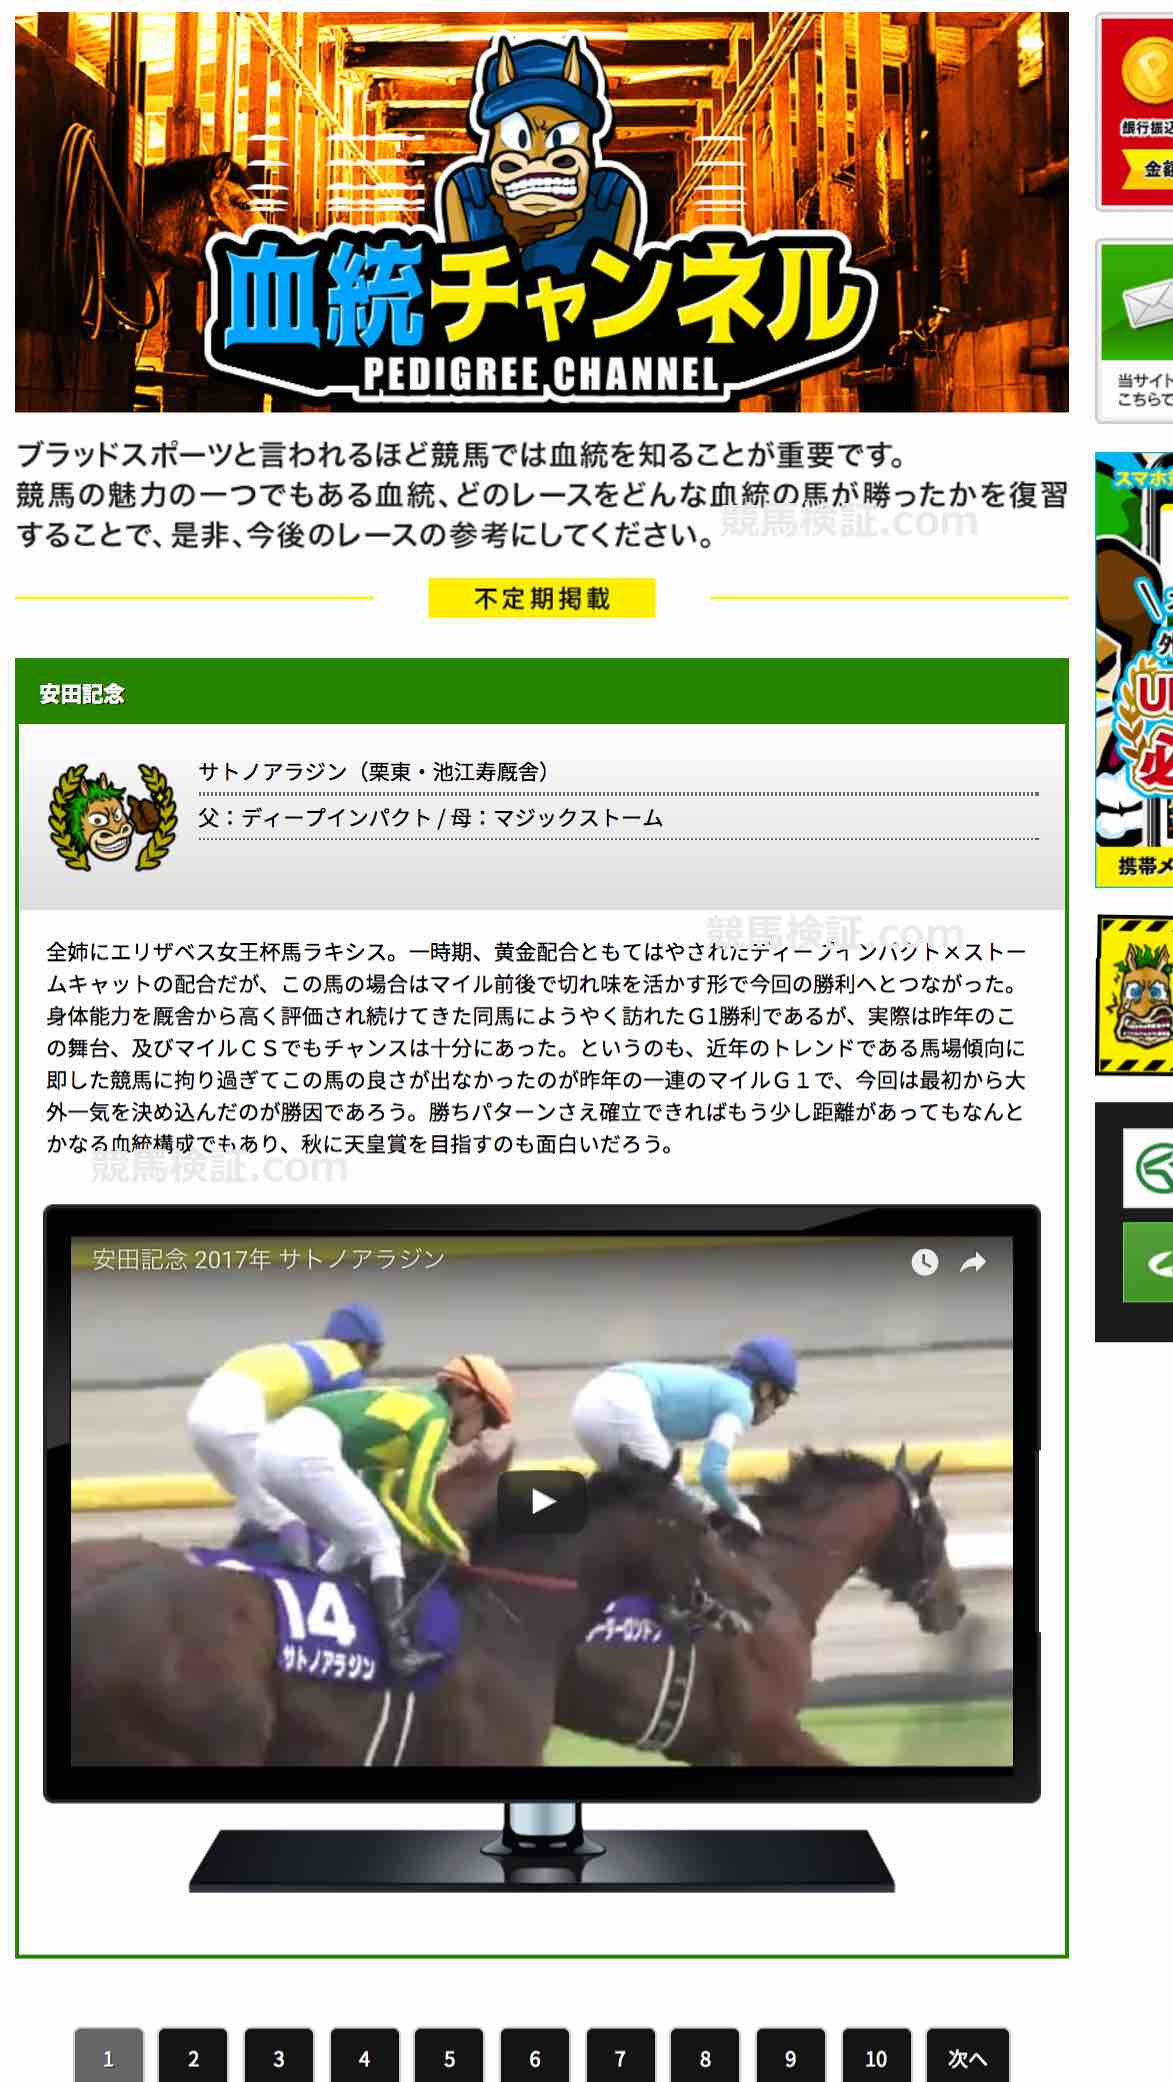 UMAチャンネル(馬チャンネル)という競馬予想サイトの血統チャンネル